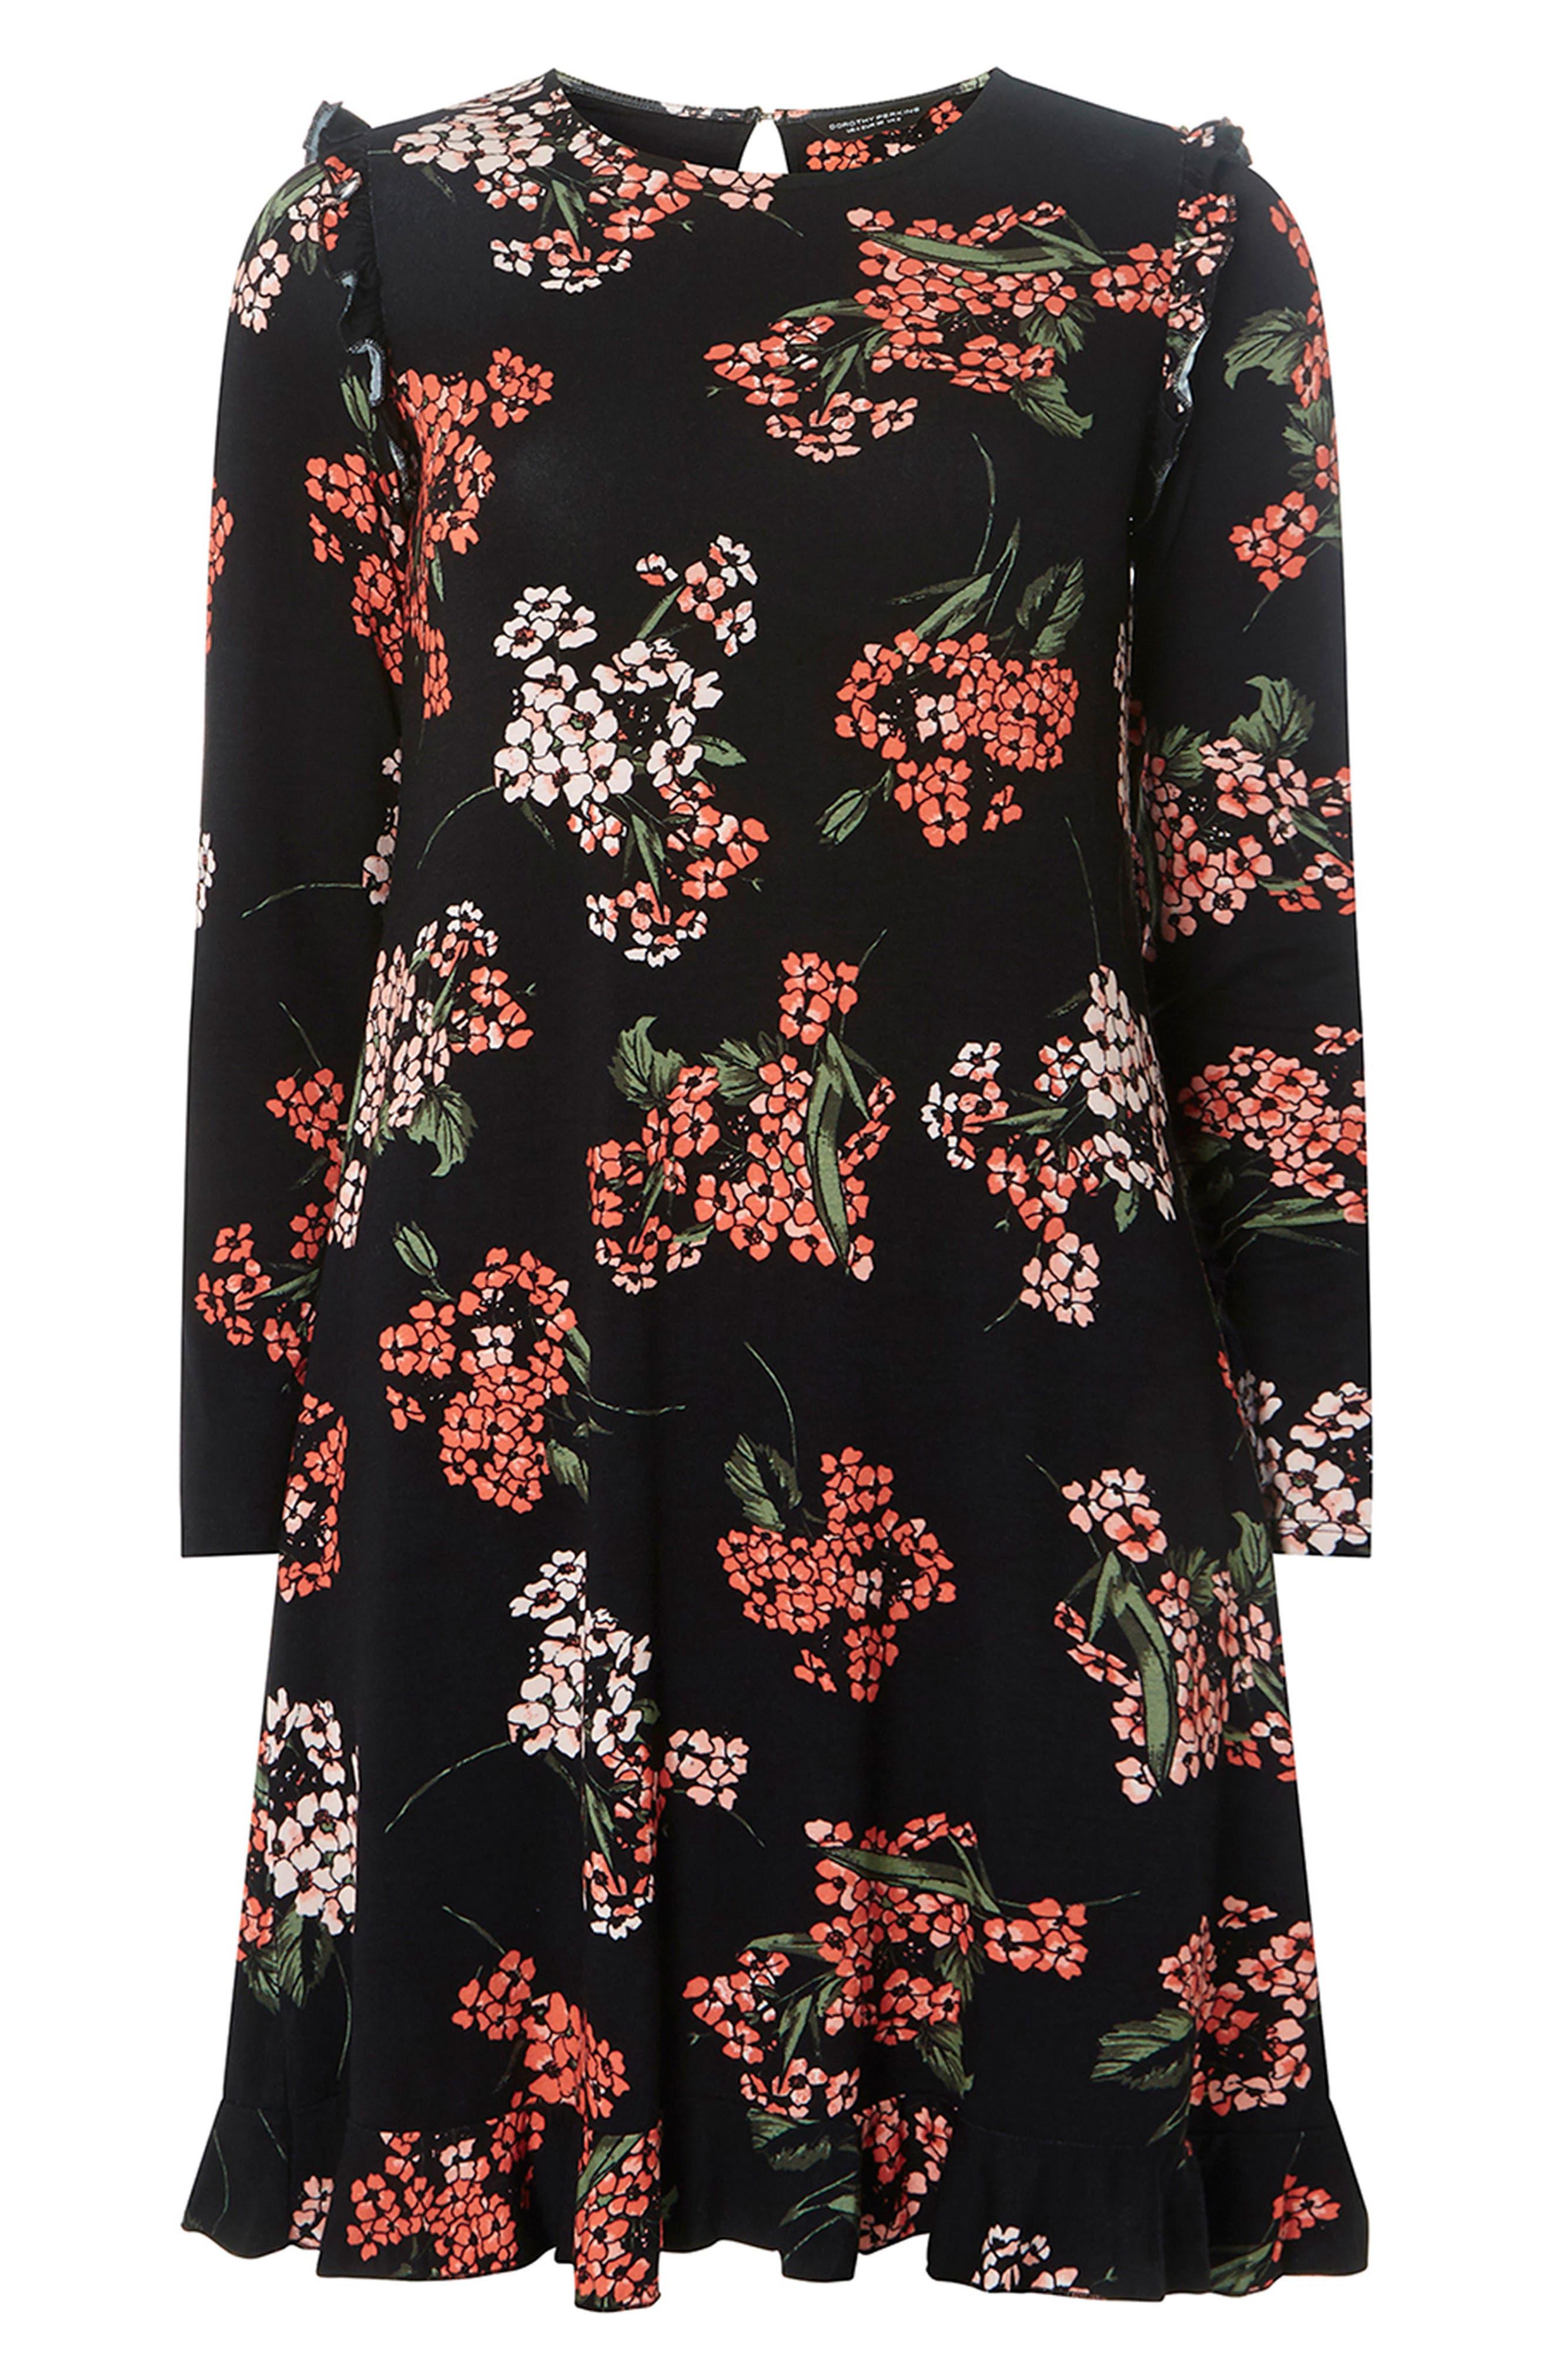 Floral Swing Dress,                             Alternate thumbnail 5, color,                             Black